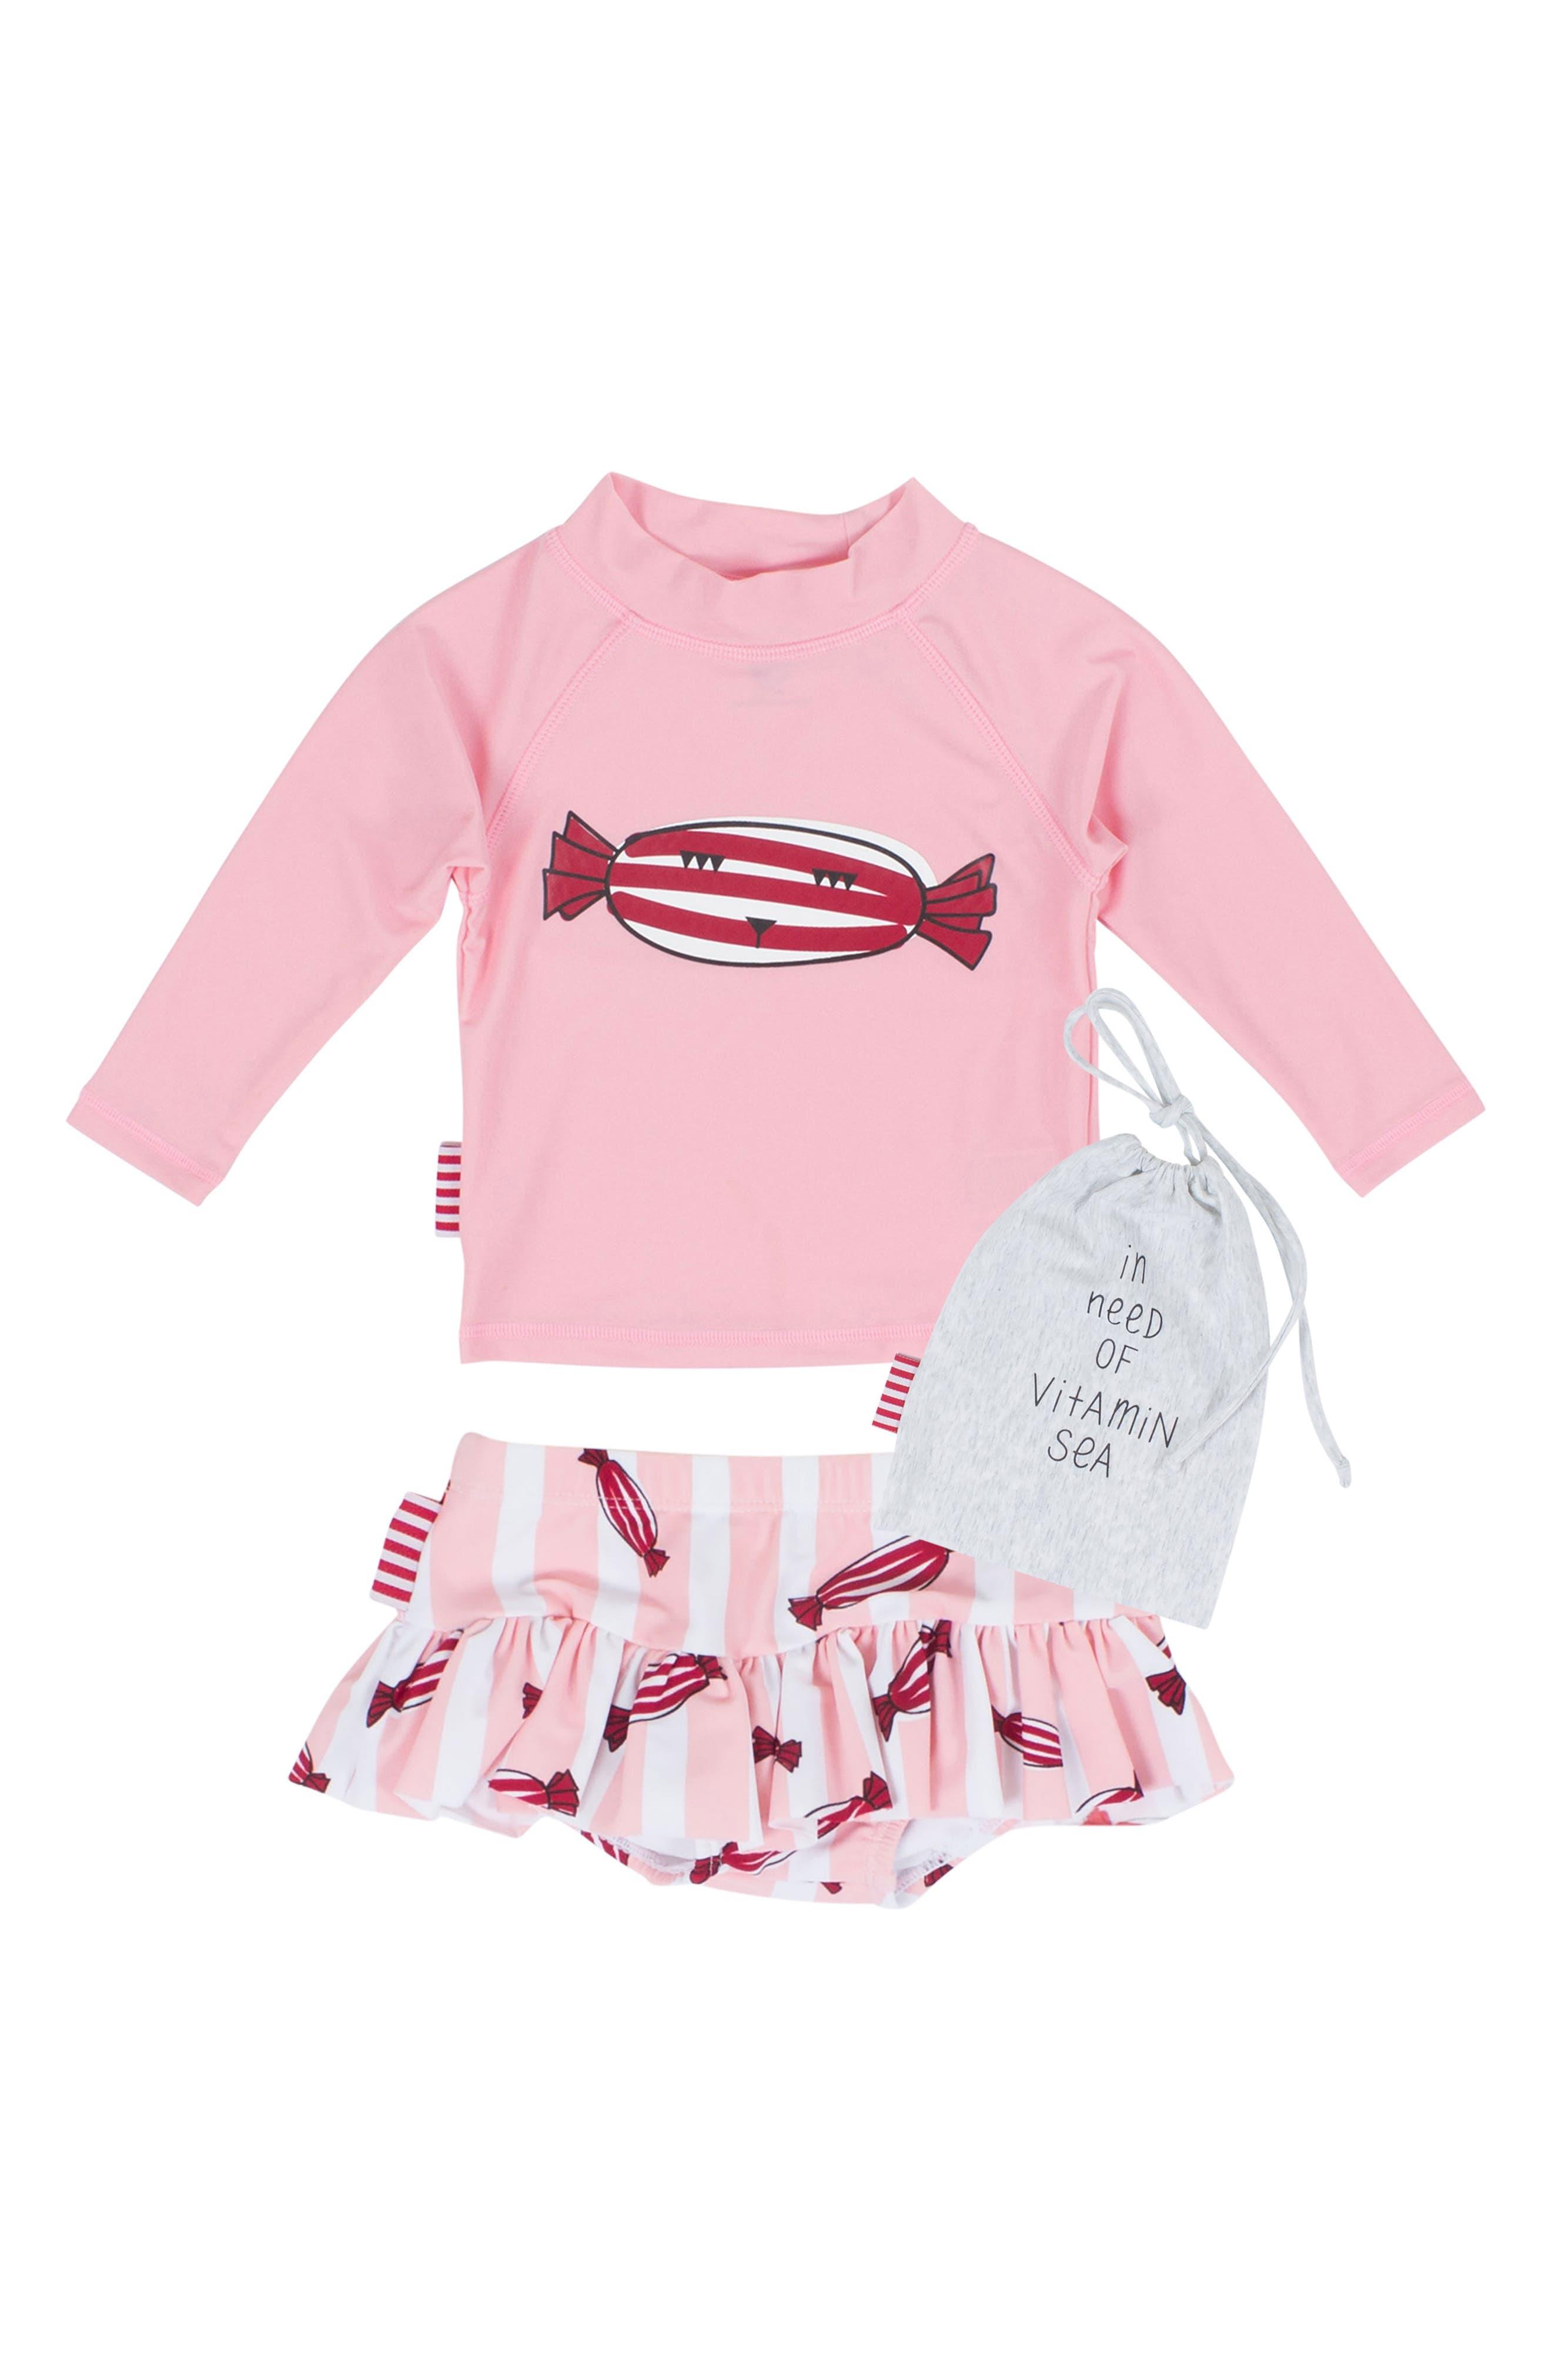 SOOKIbaby Bonbon Two-Piece Rashguard Swimsuit (Baby Girls & Toddler Girls)